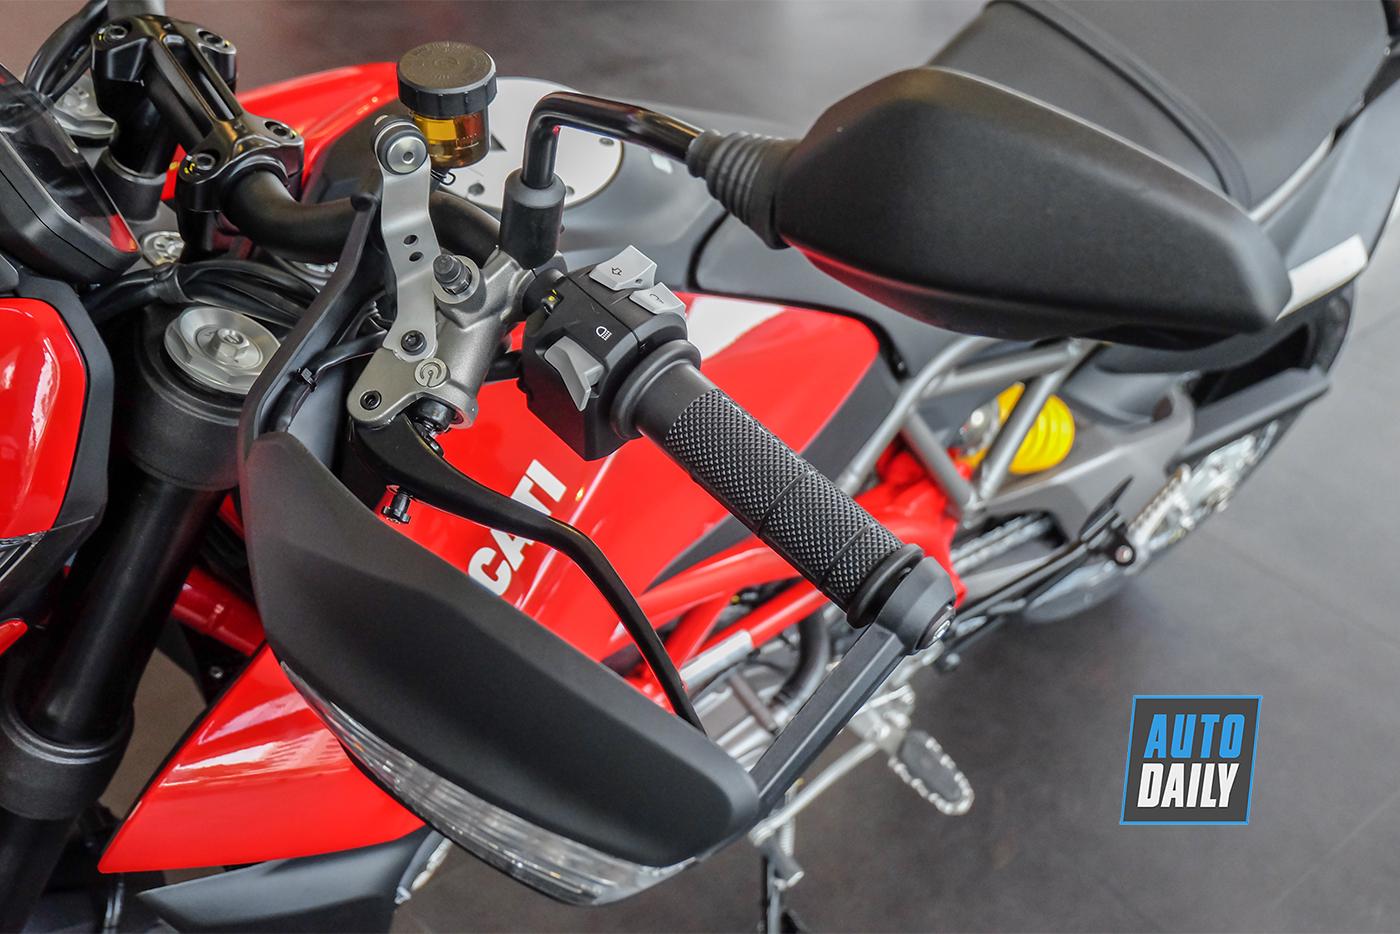 ducati-hypermotard-950-2019-90.jpg